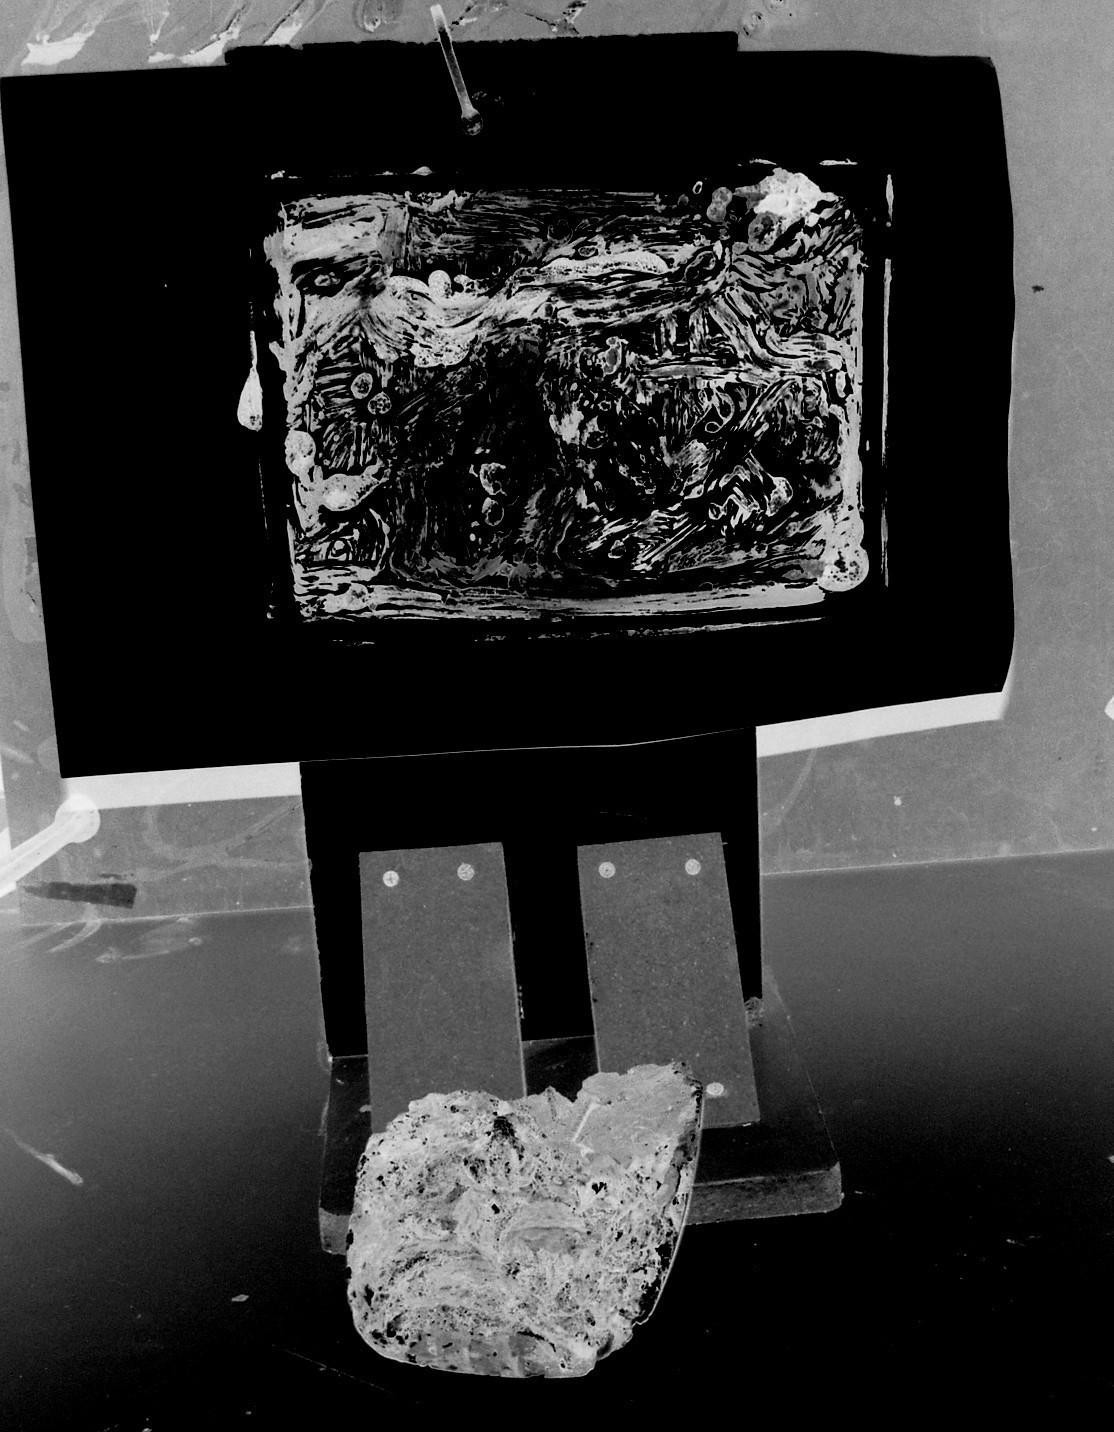 Geist 2,  2016, inkjet pigment print on matte paper, 8.5 x 11 IN.